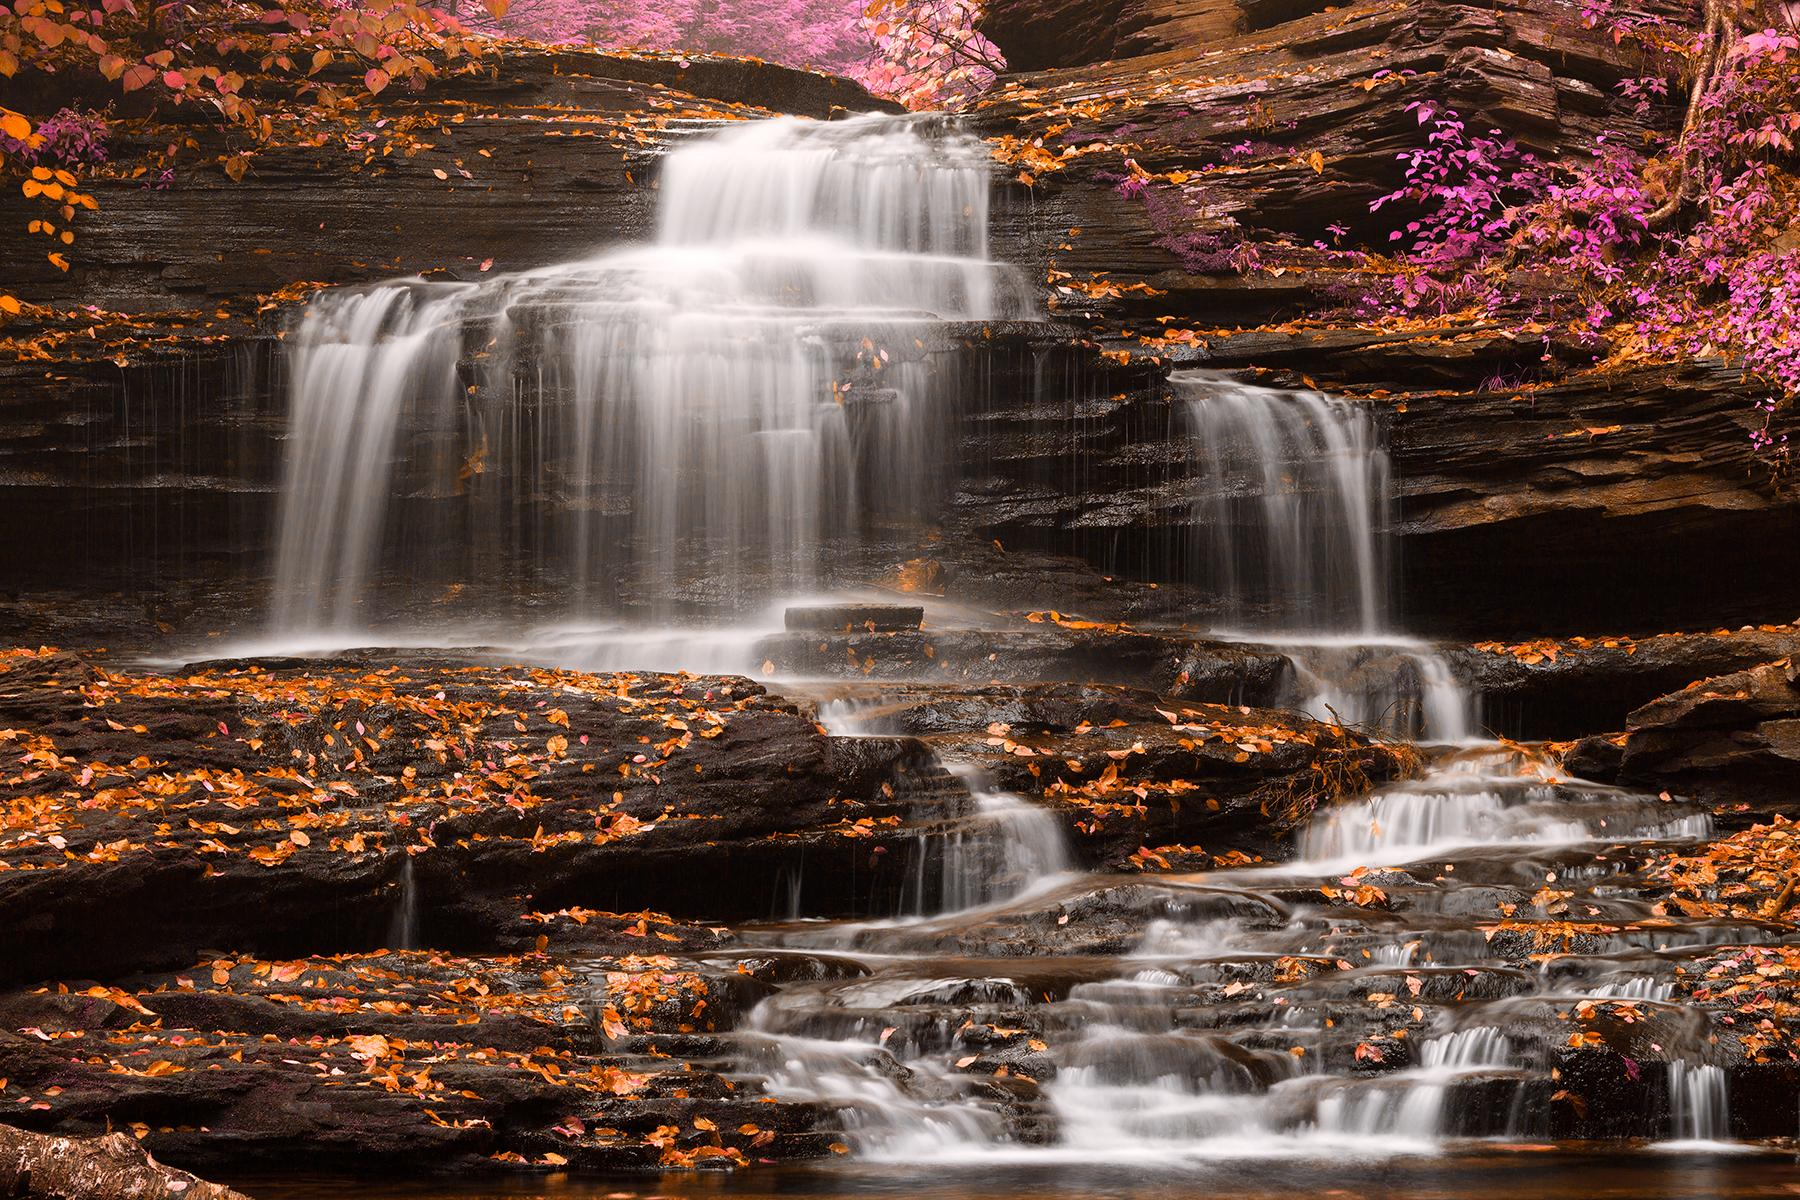 Onondaga falls - pastel fantasy photo